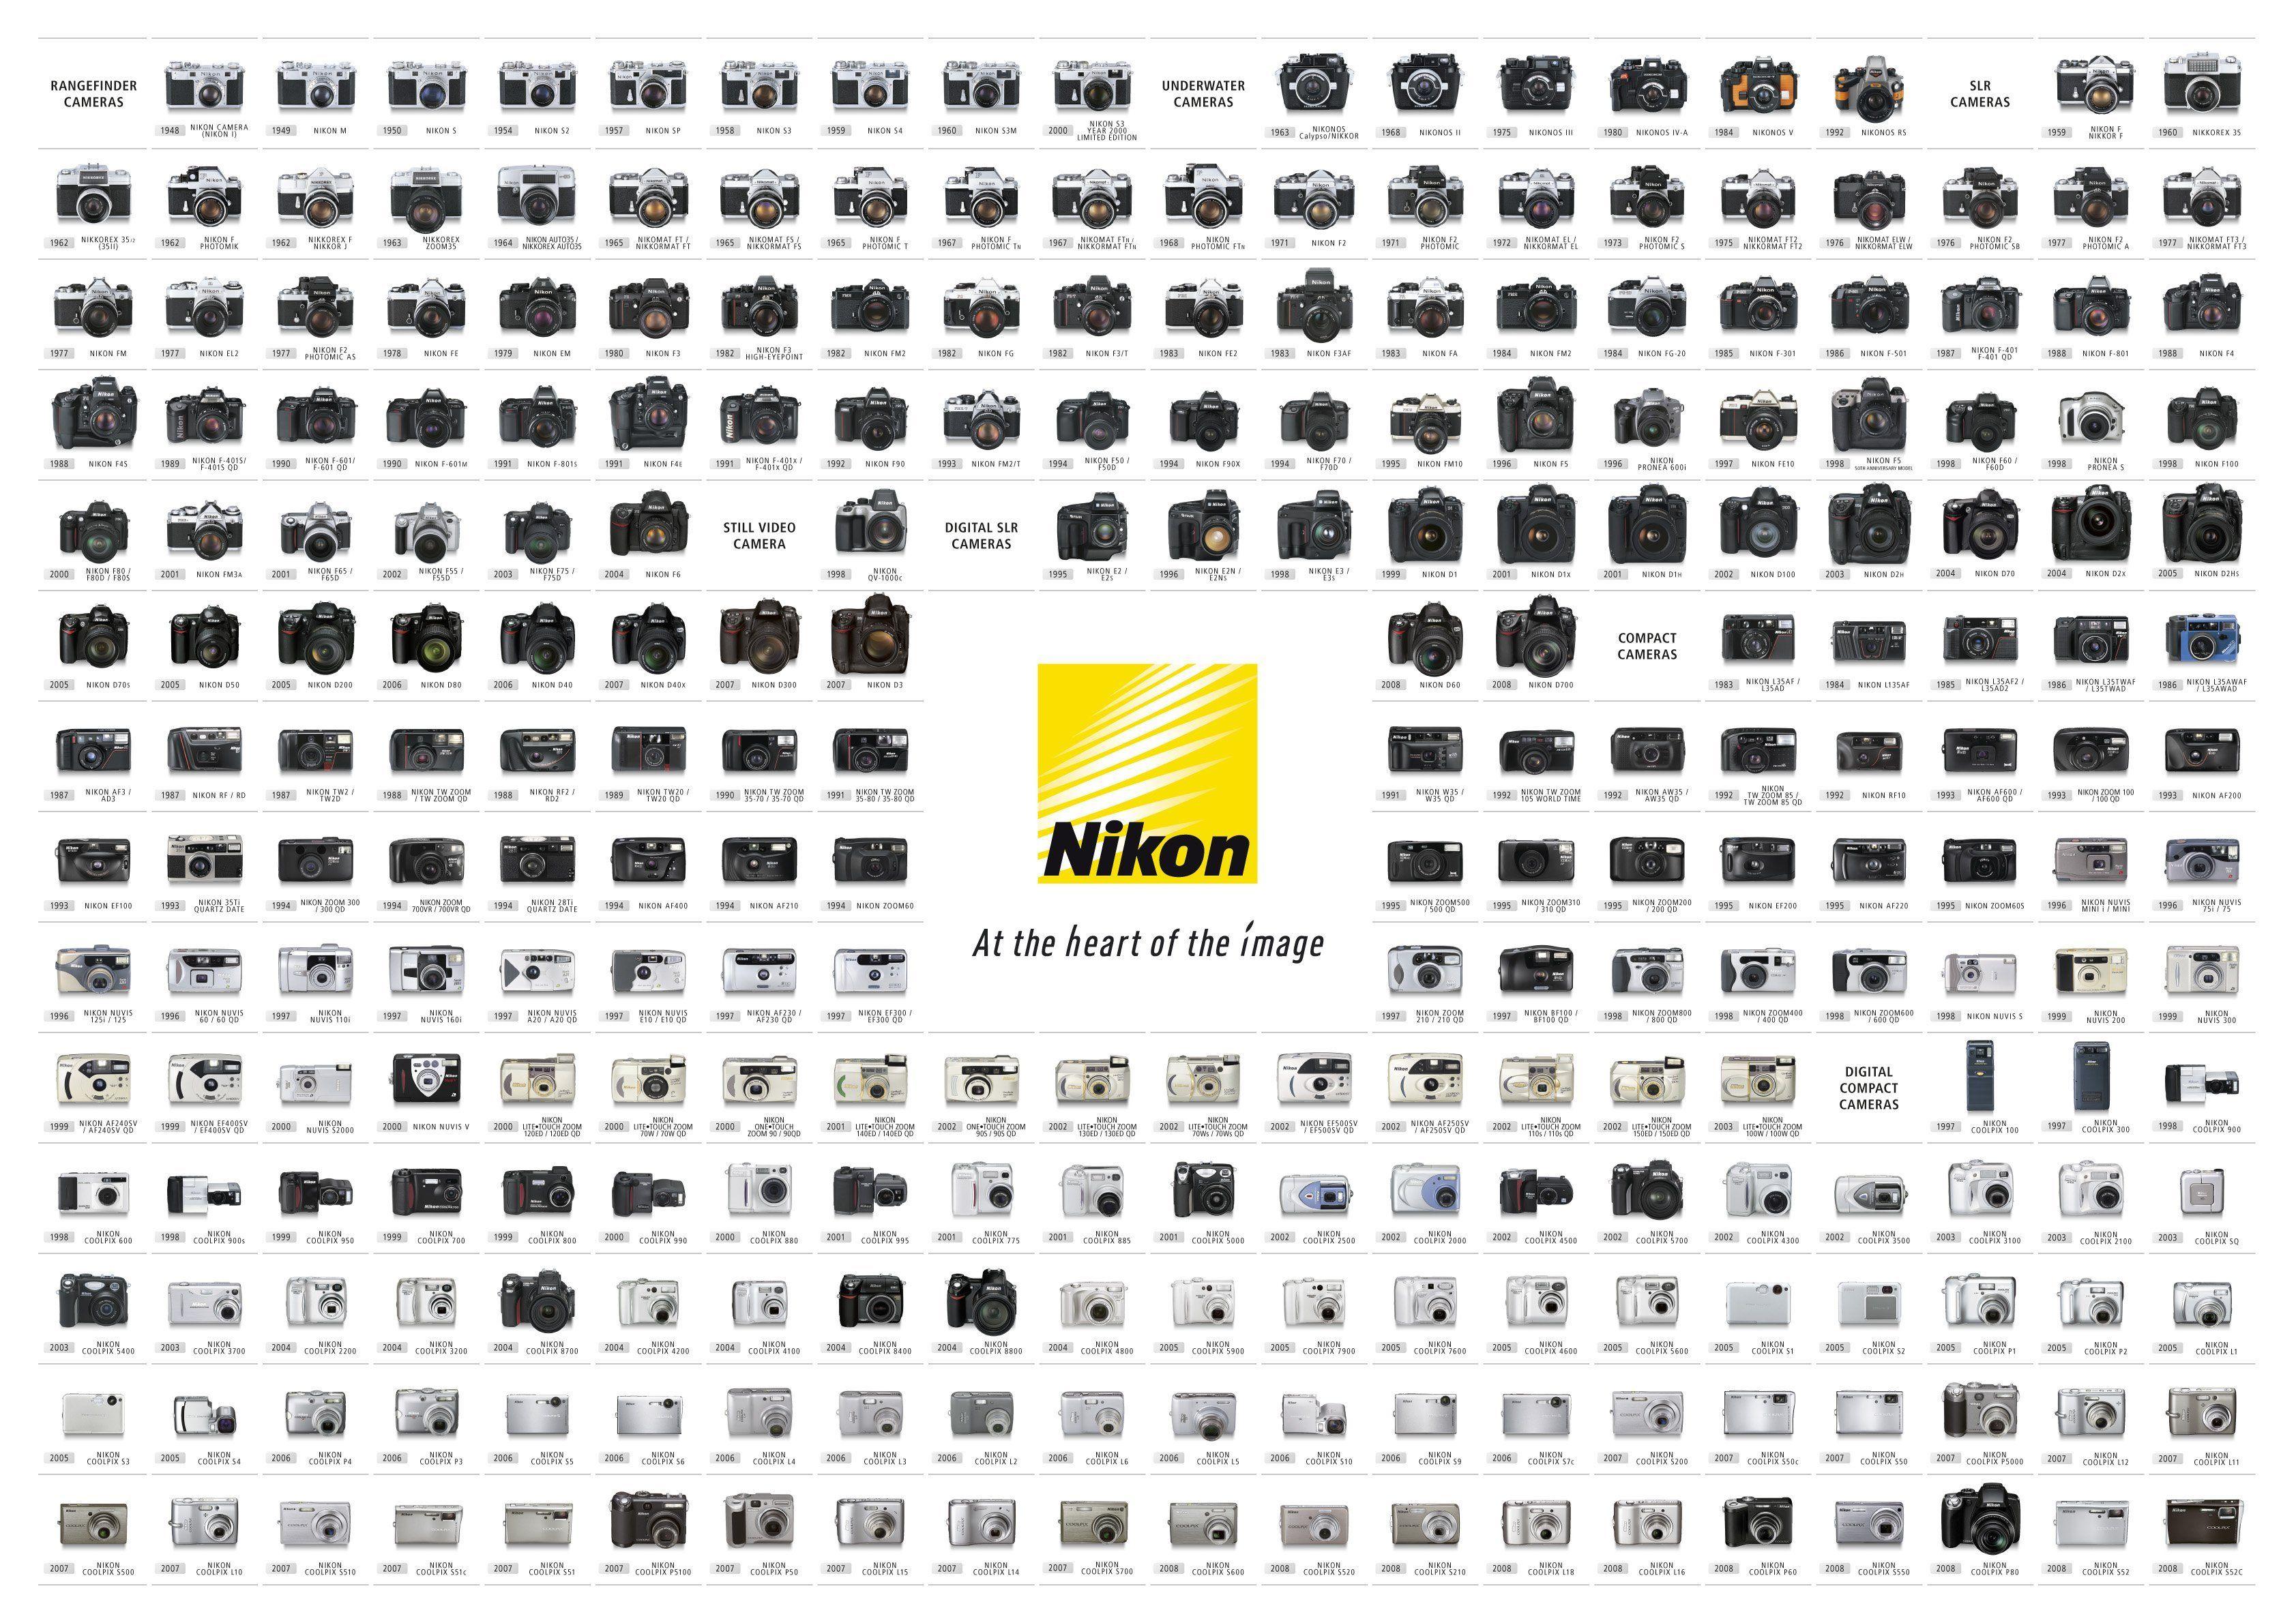 nikon camera timeline Gallery